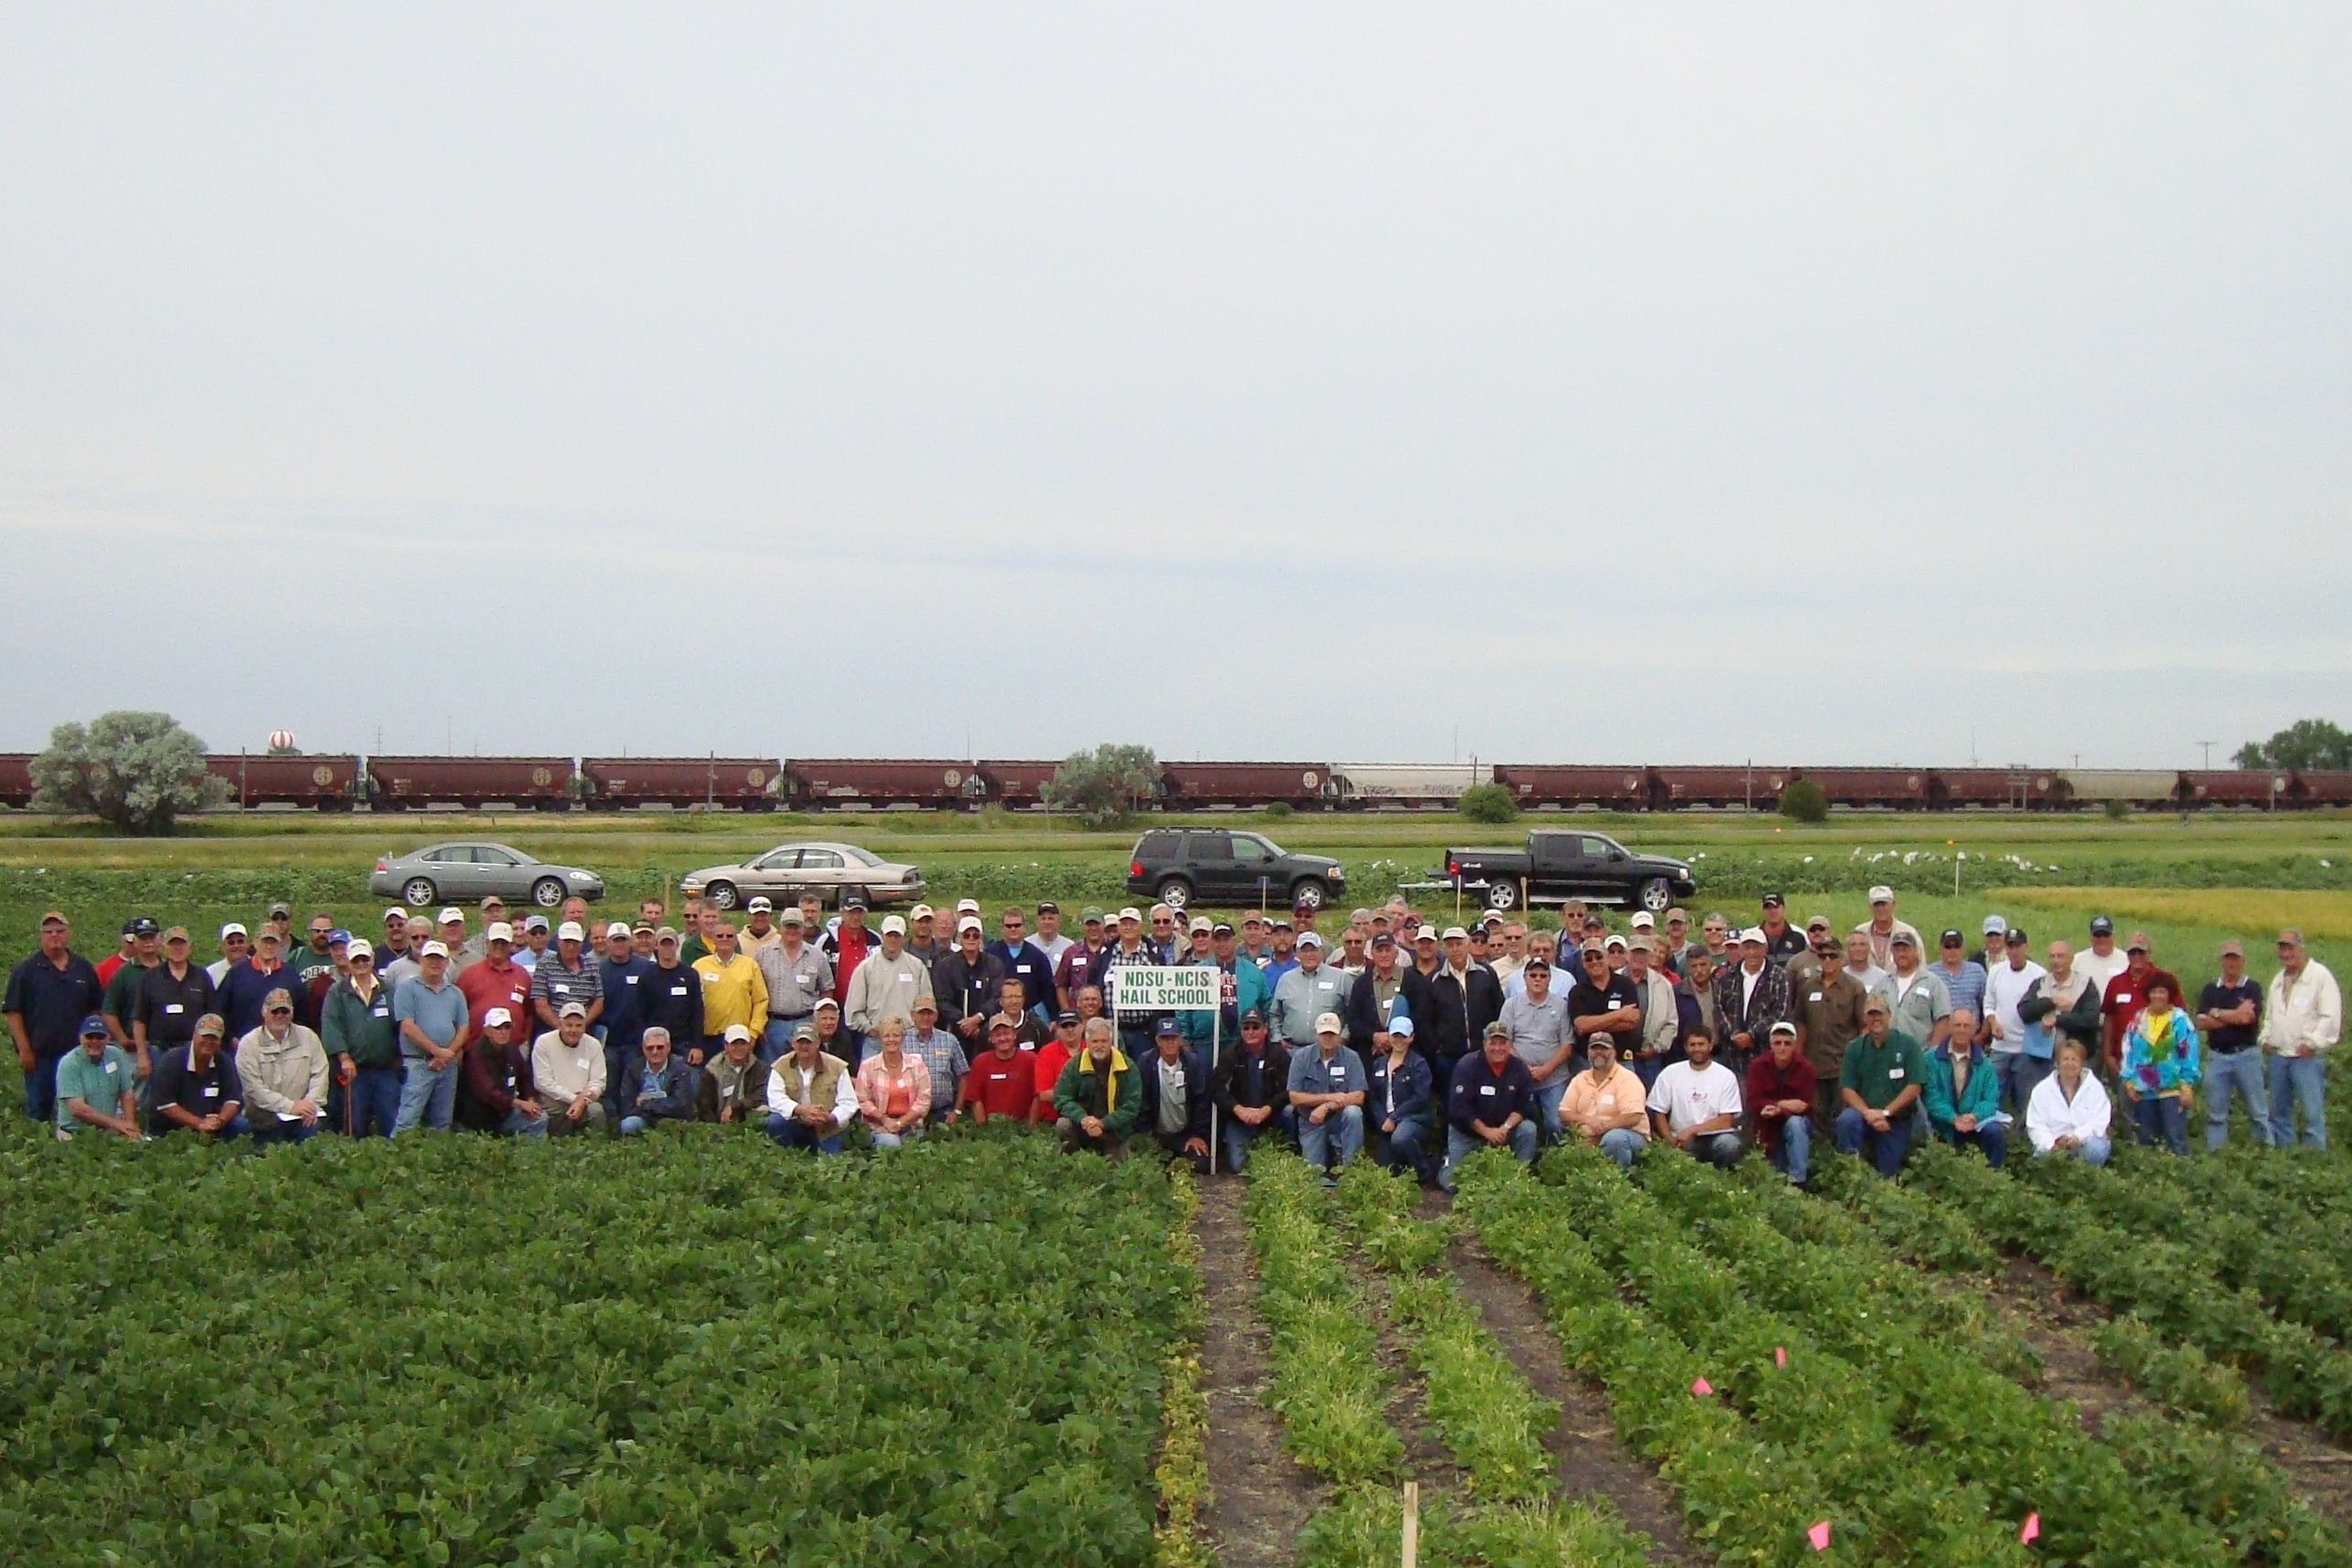 2009 NCIS Fargo, ND CropHail School CropInsurance (With